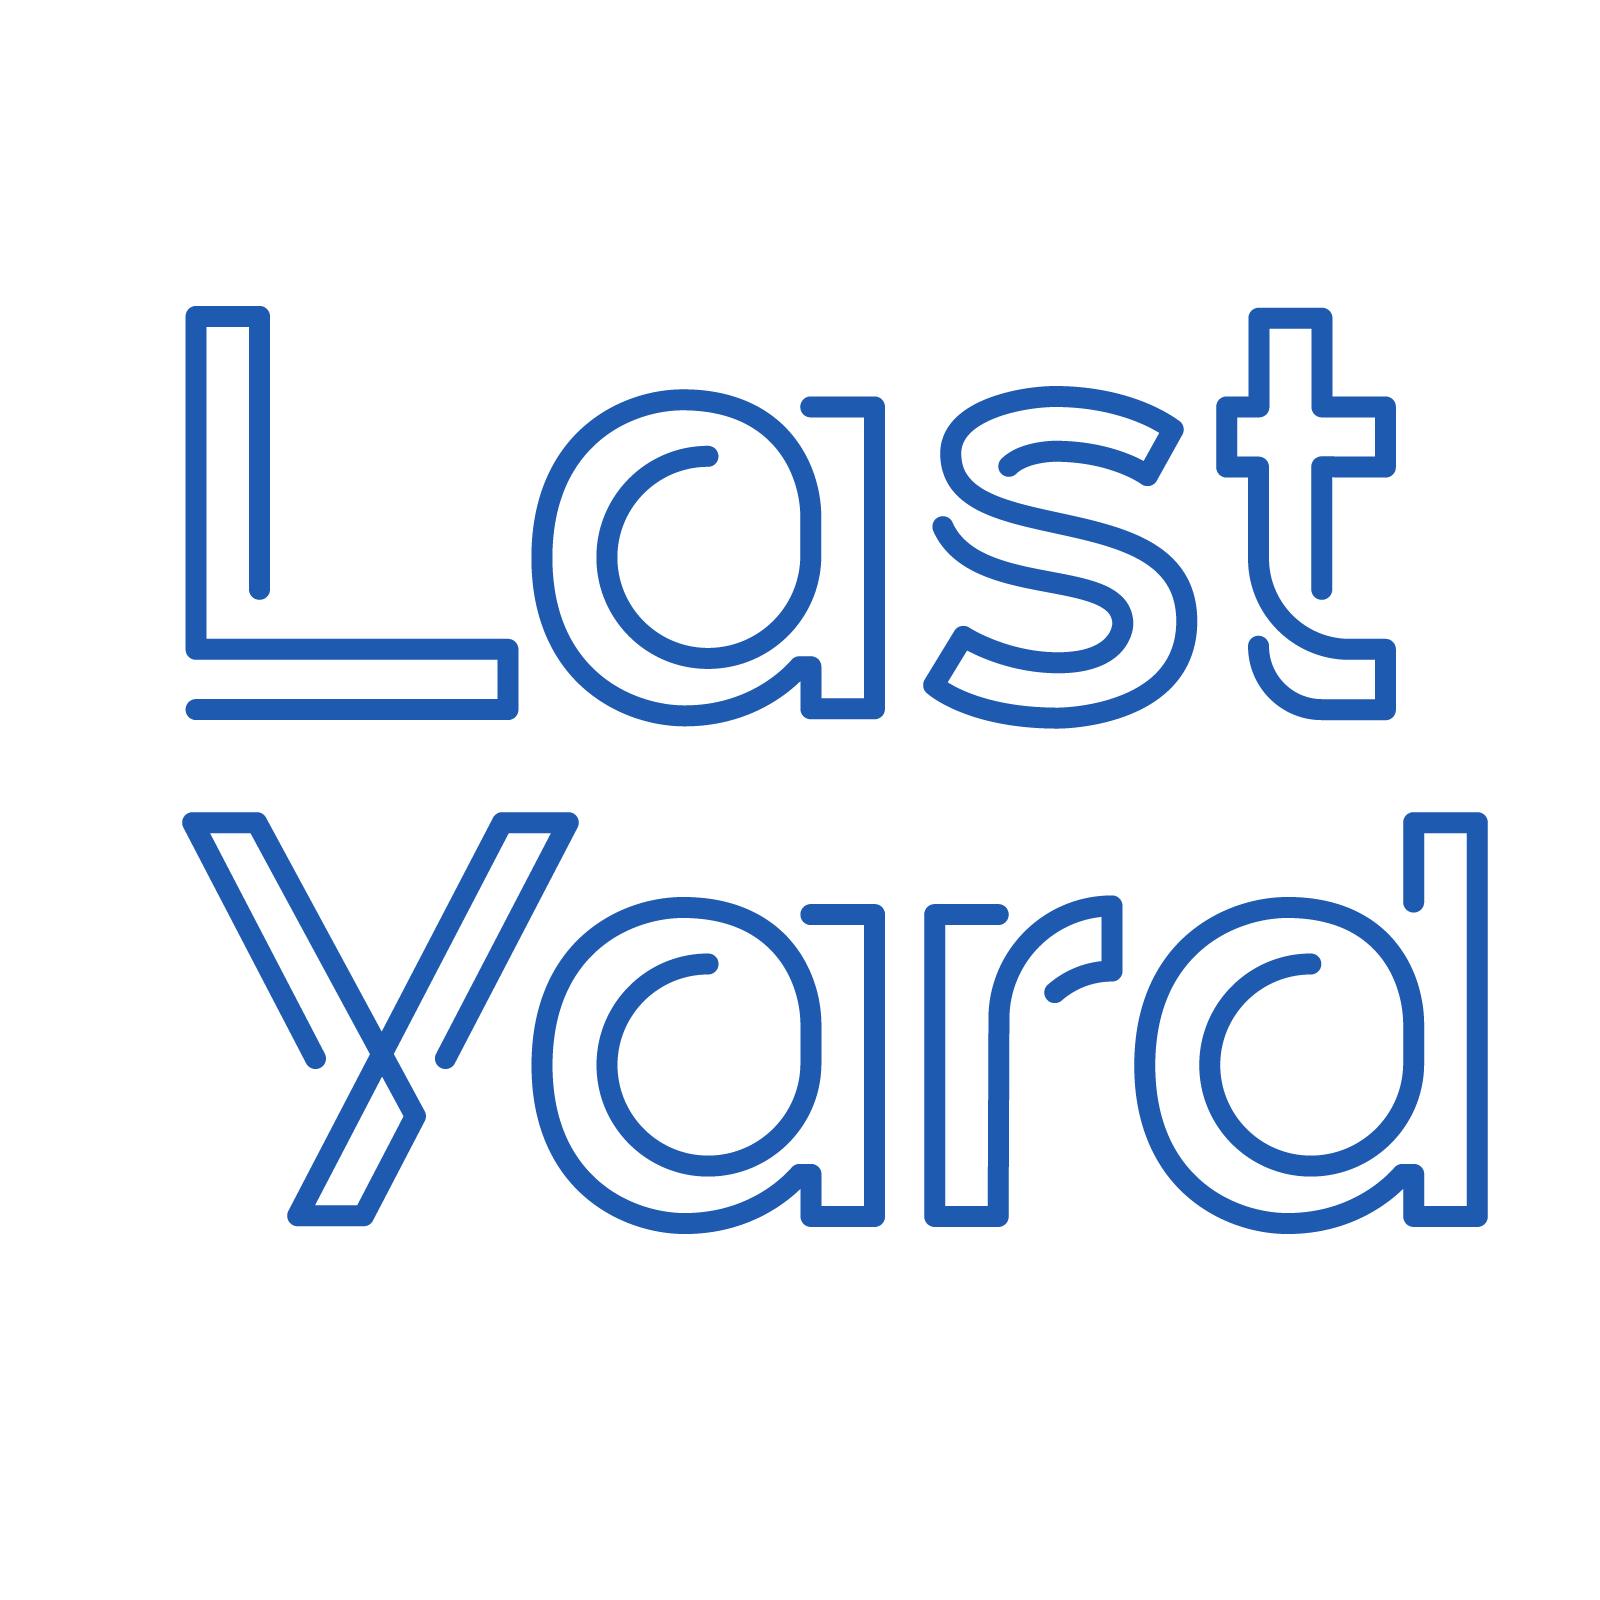 Last Yard logo